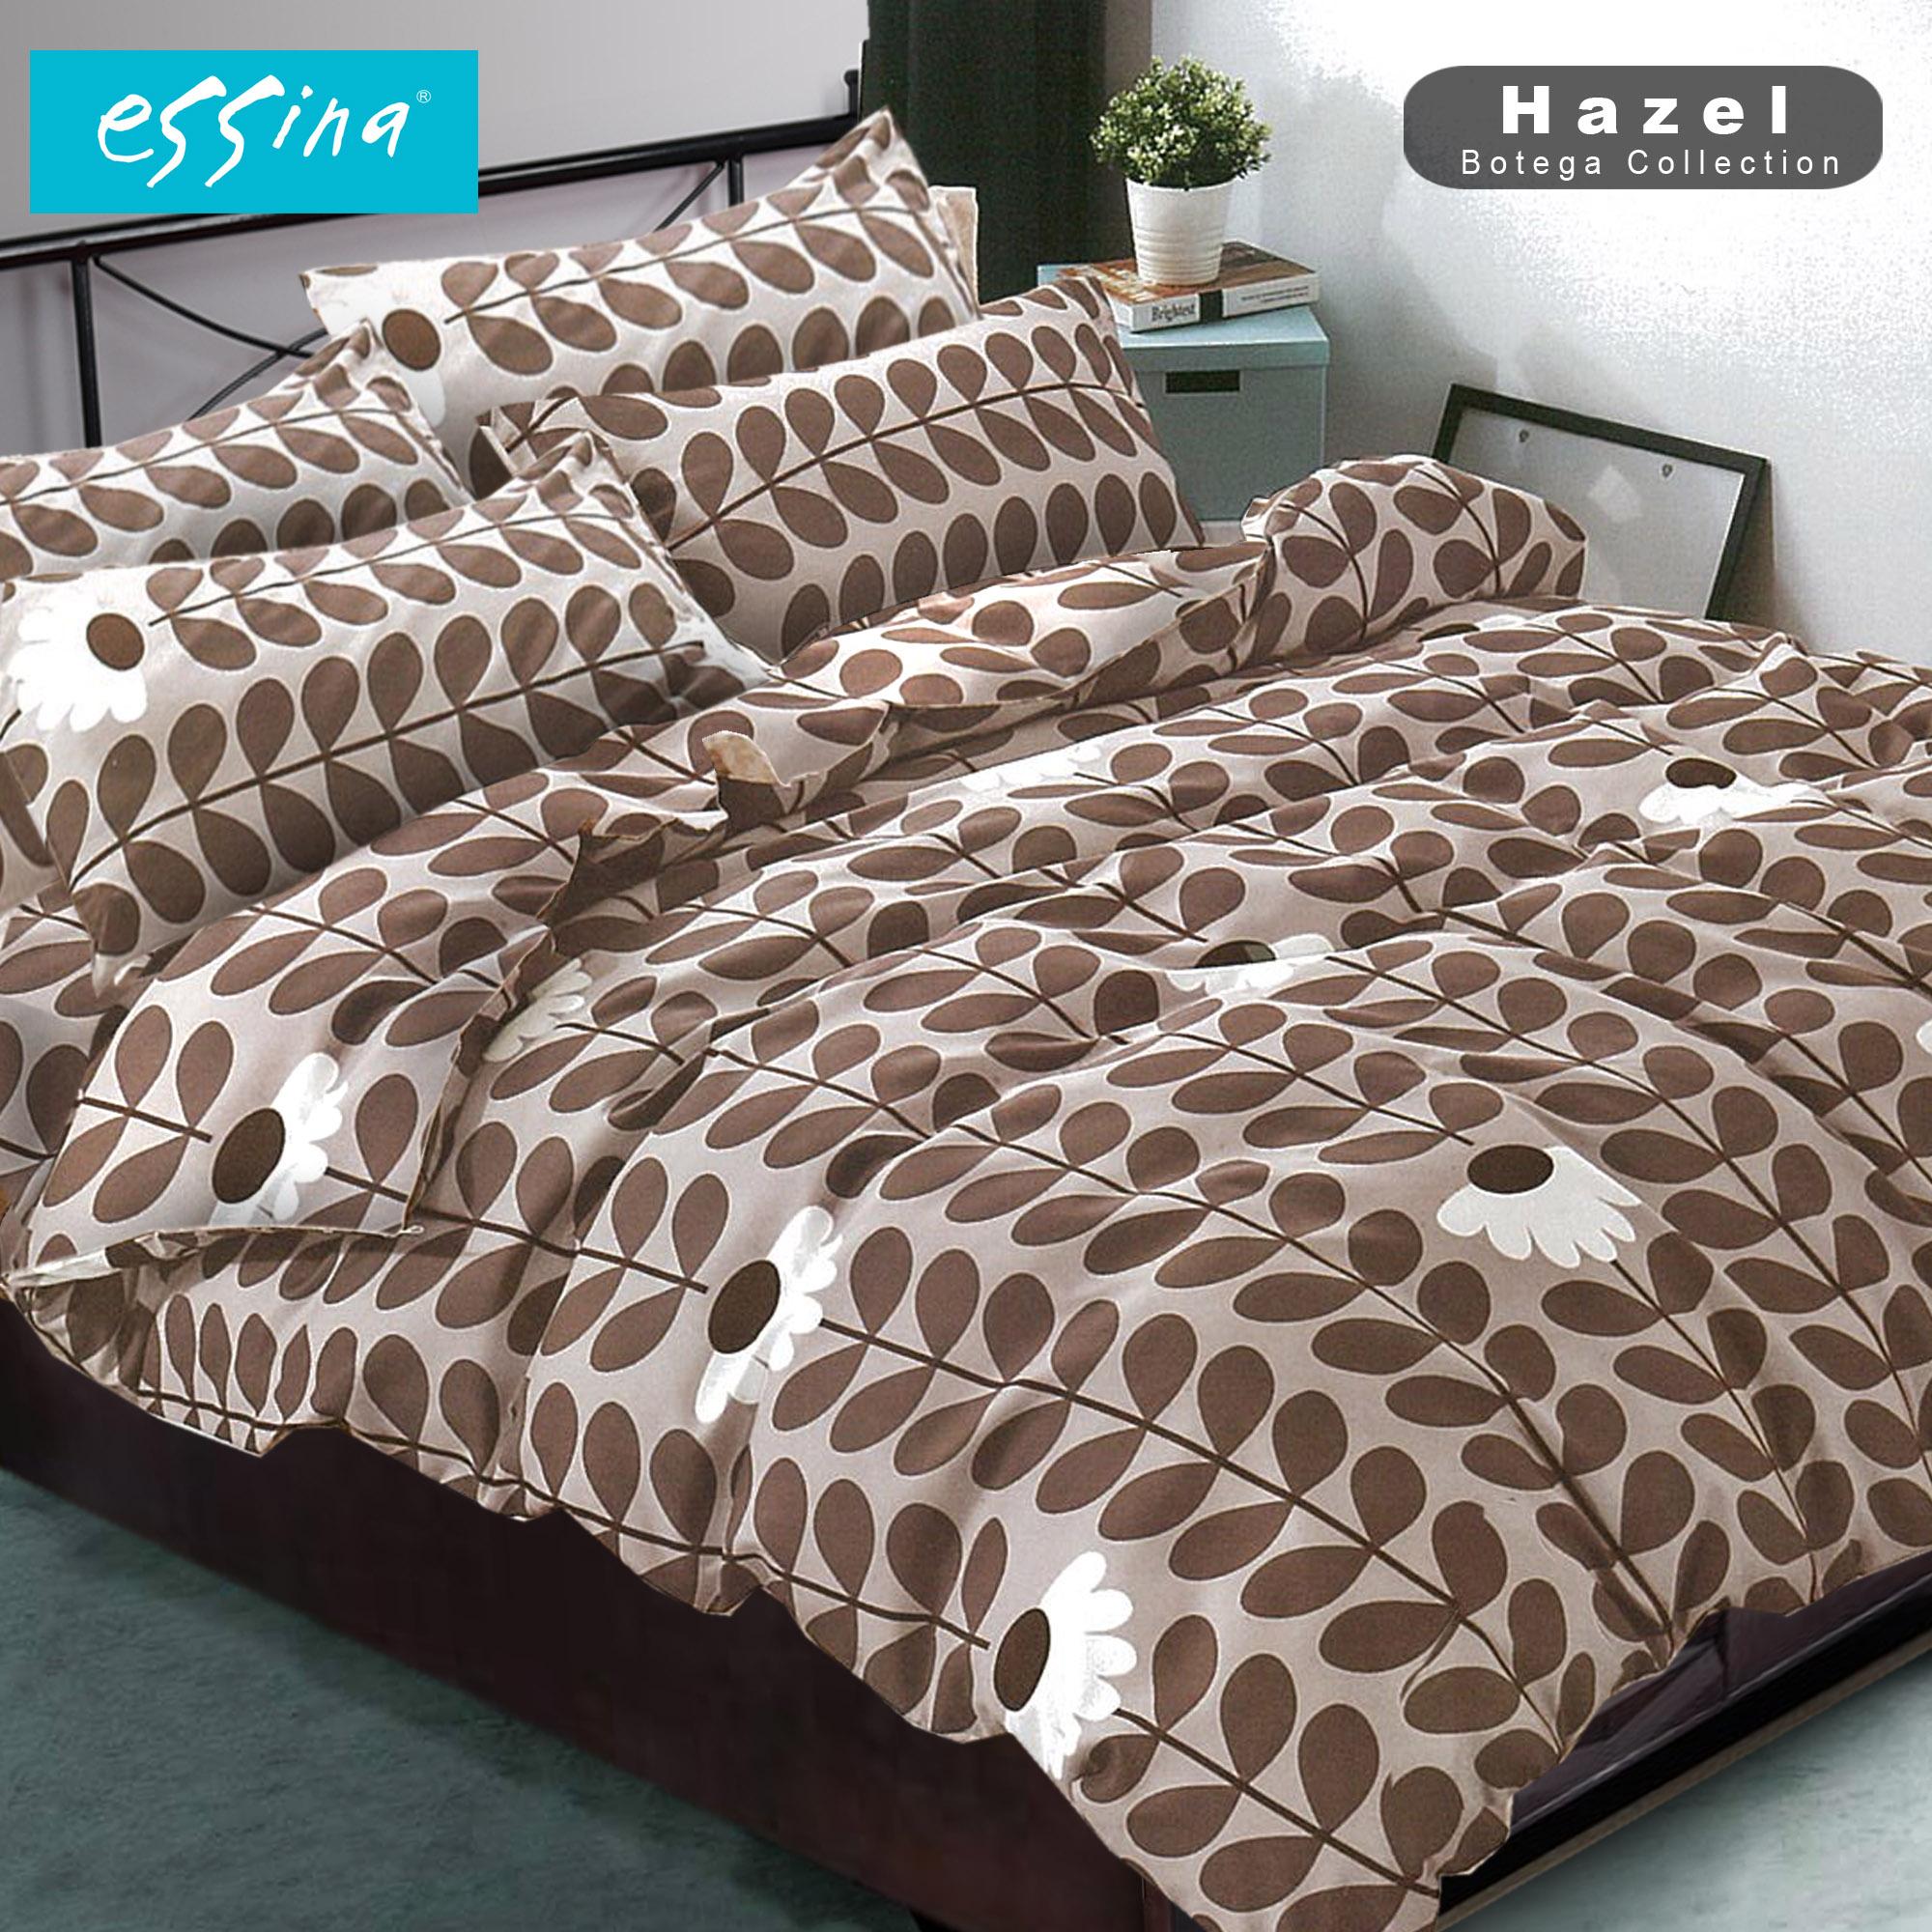 Essina Bottega Classic & Vintage Comforter & Fitted Bed Sheet set Cadar Microfiber set Queen size ( 4 in 1)  ( 33cm High Mattress ) ( Adessa / Tiffany / Hazel )